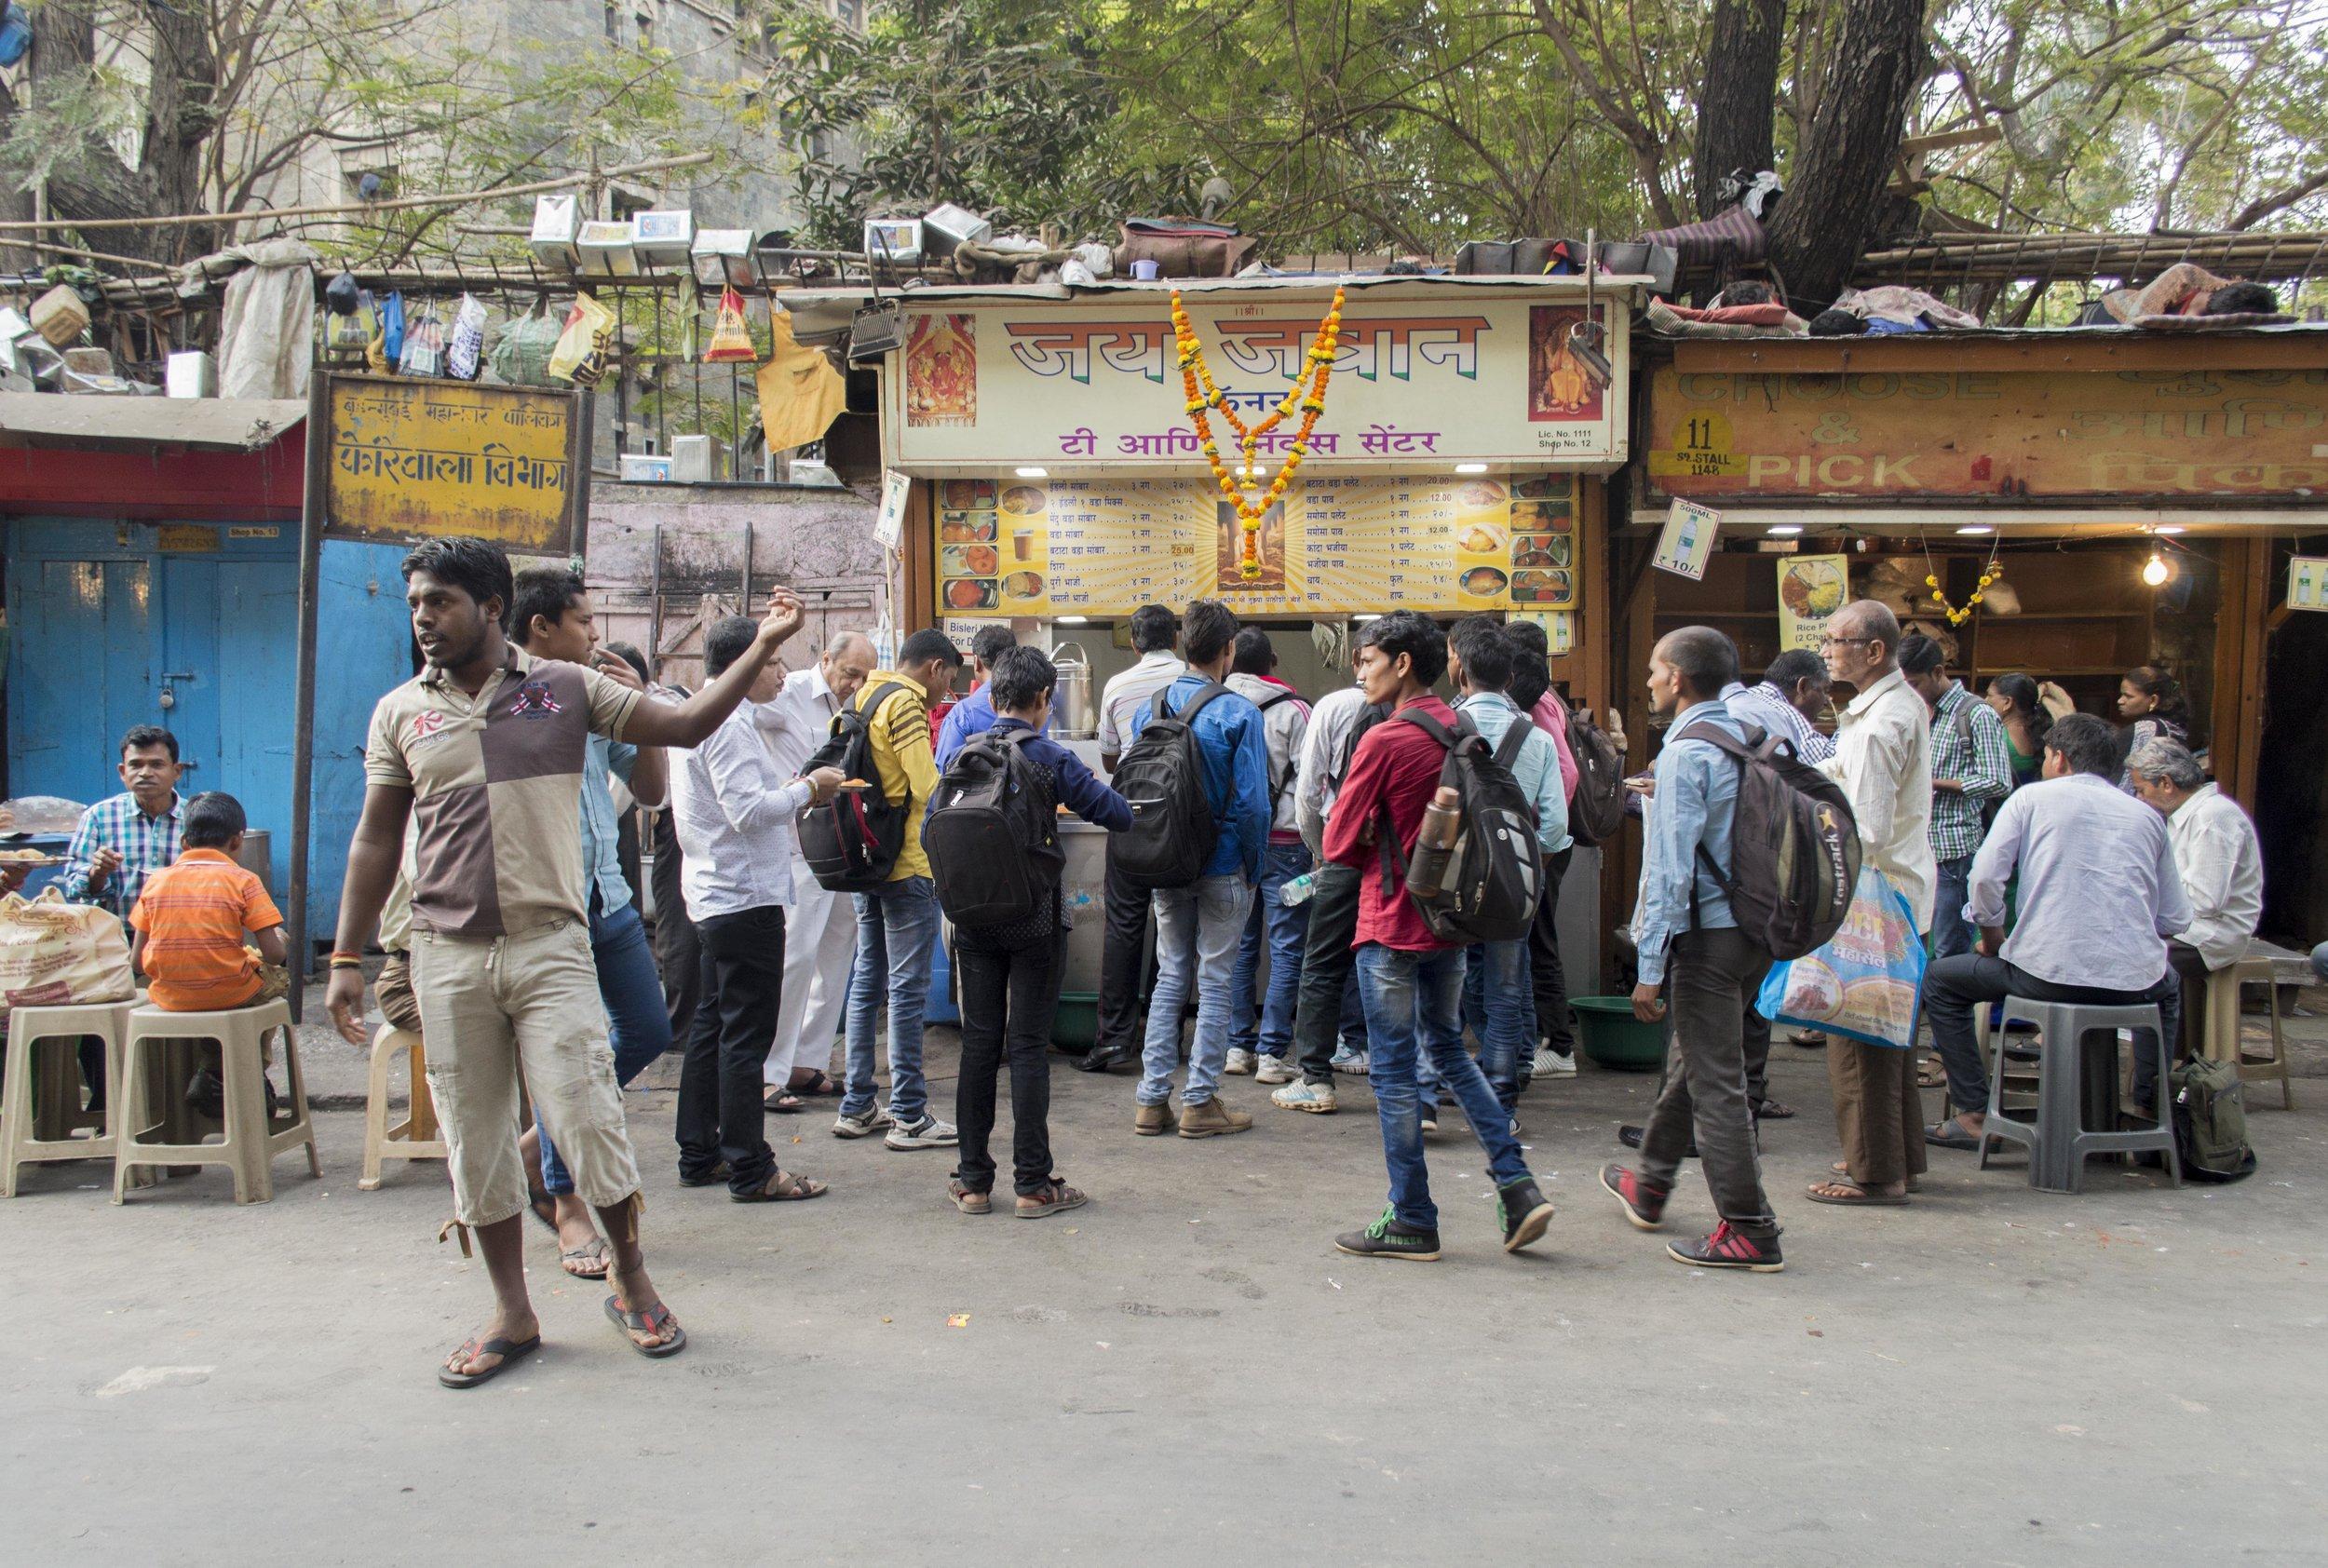 queueing at Jai JAwan kiosk Mumbai.jpg